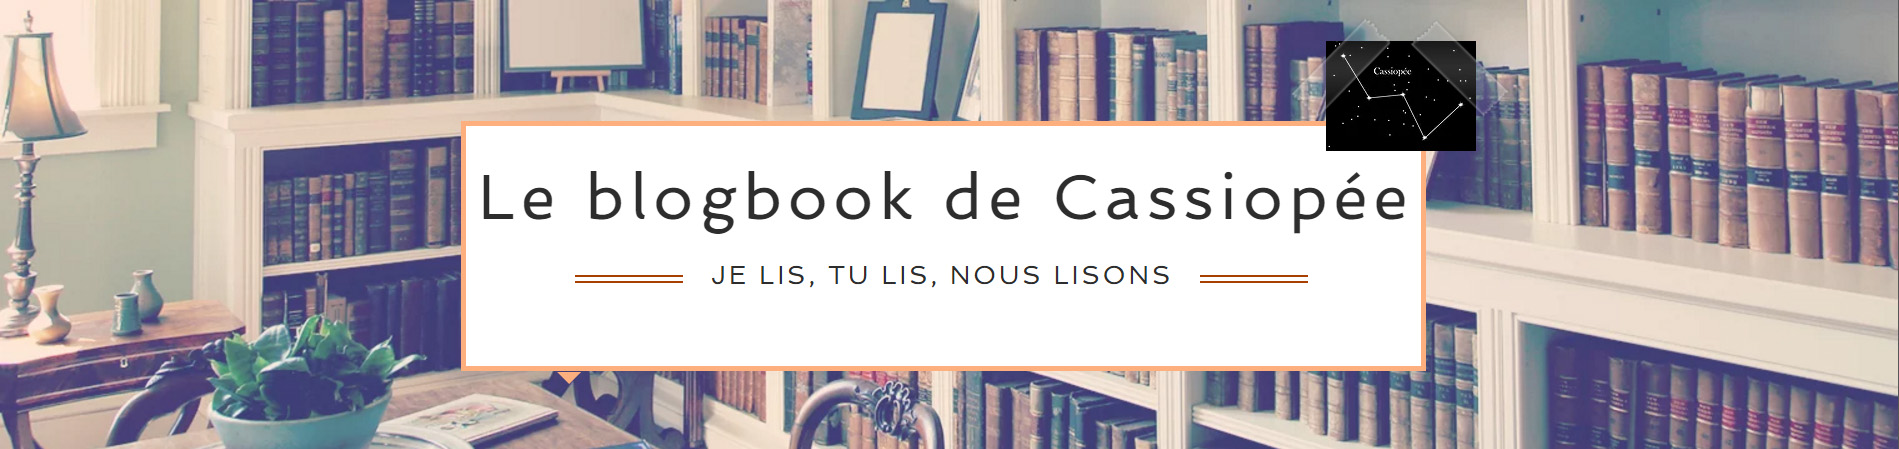 Le blogbook de Cassiopée